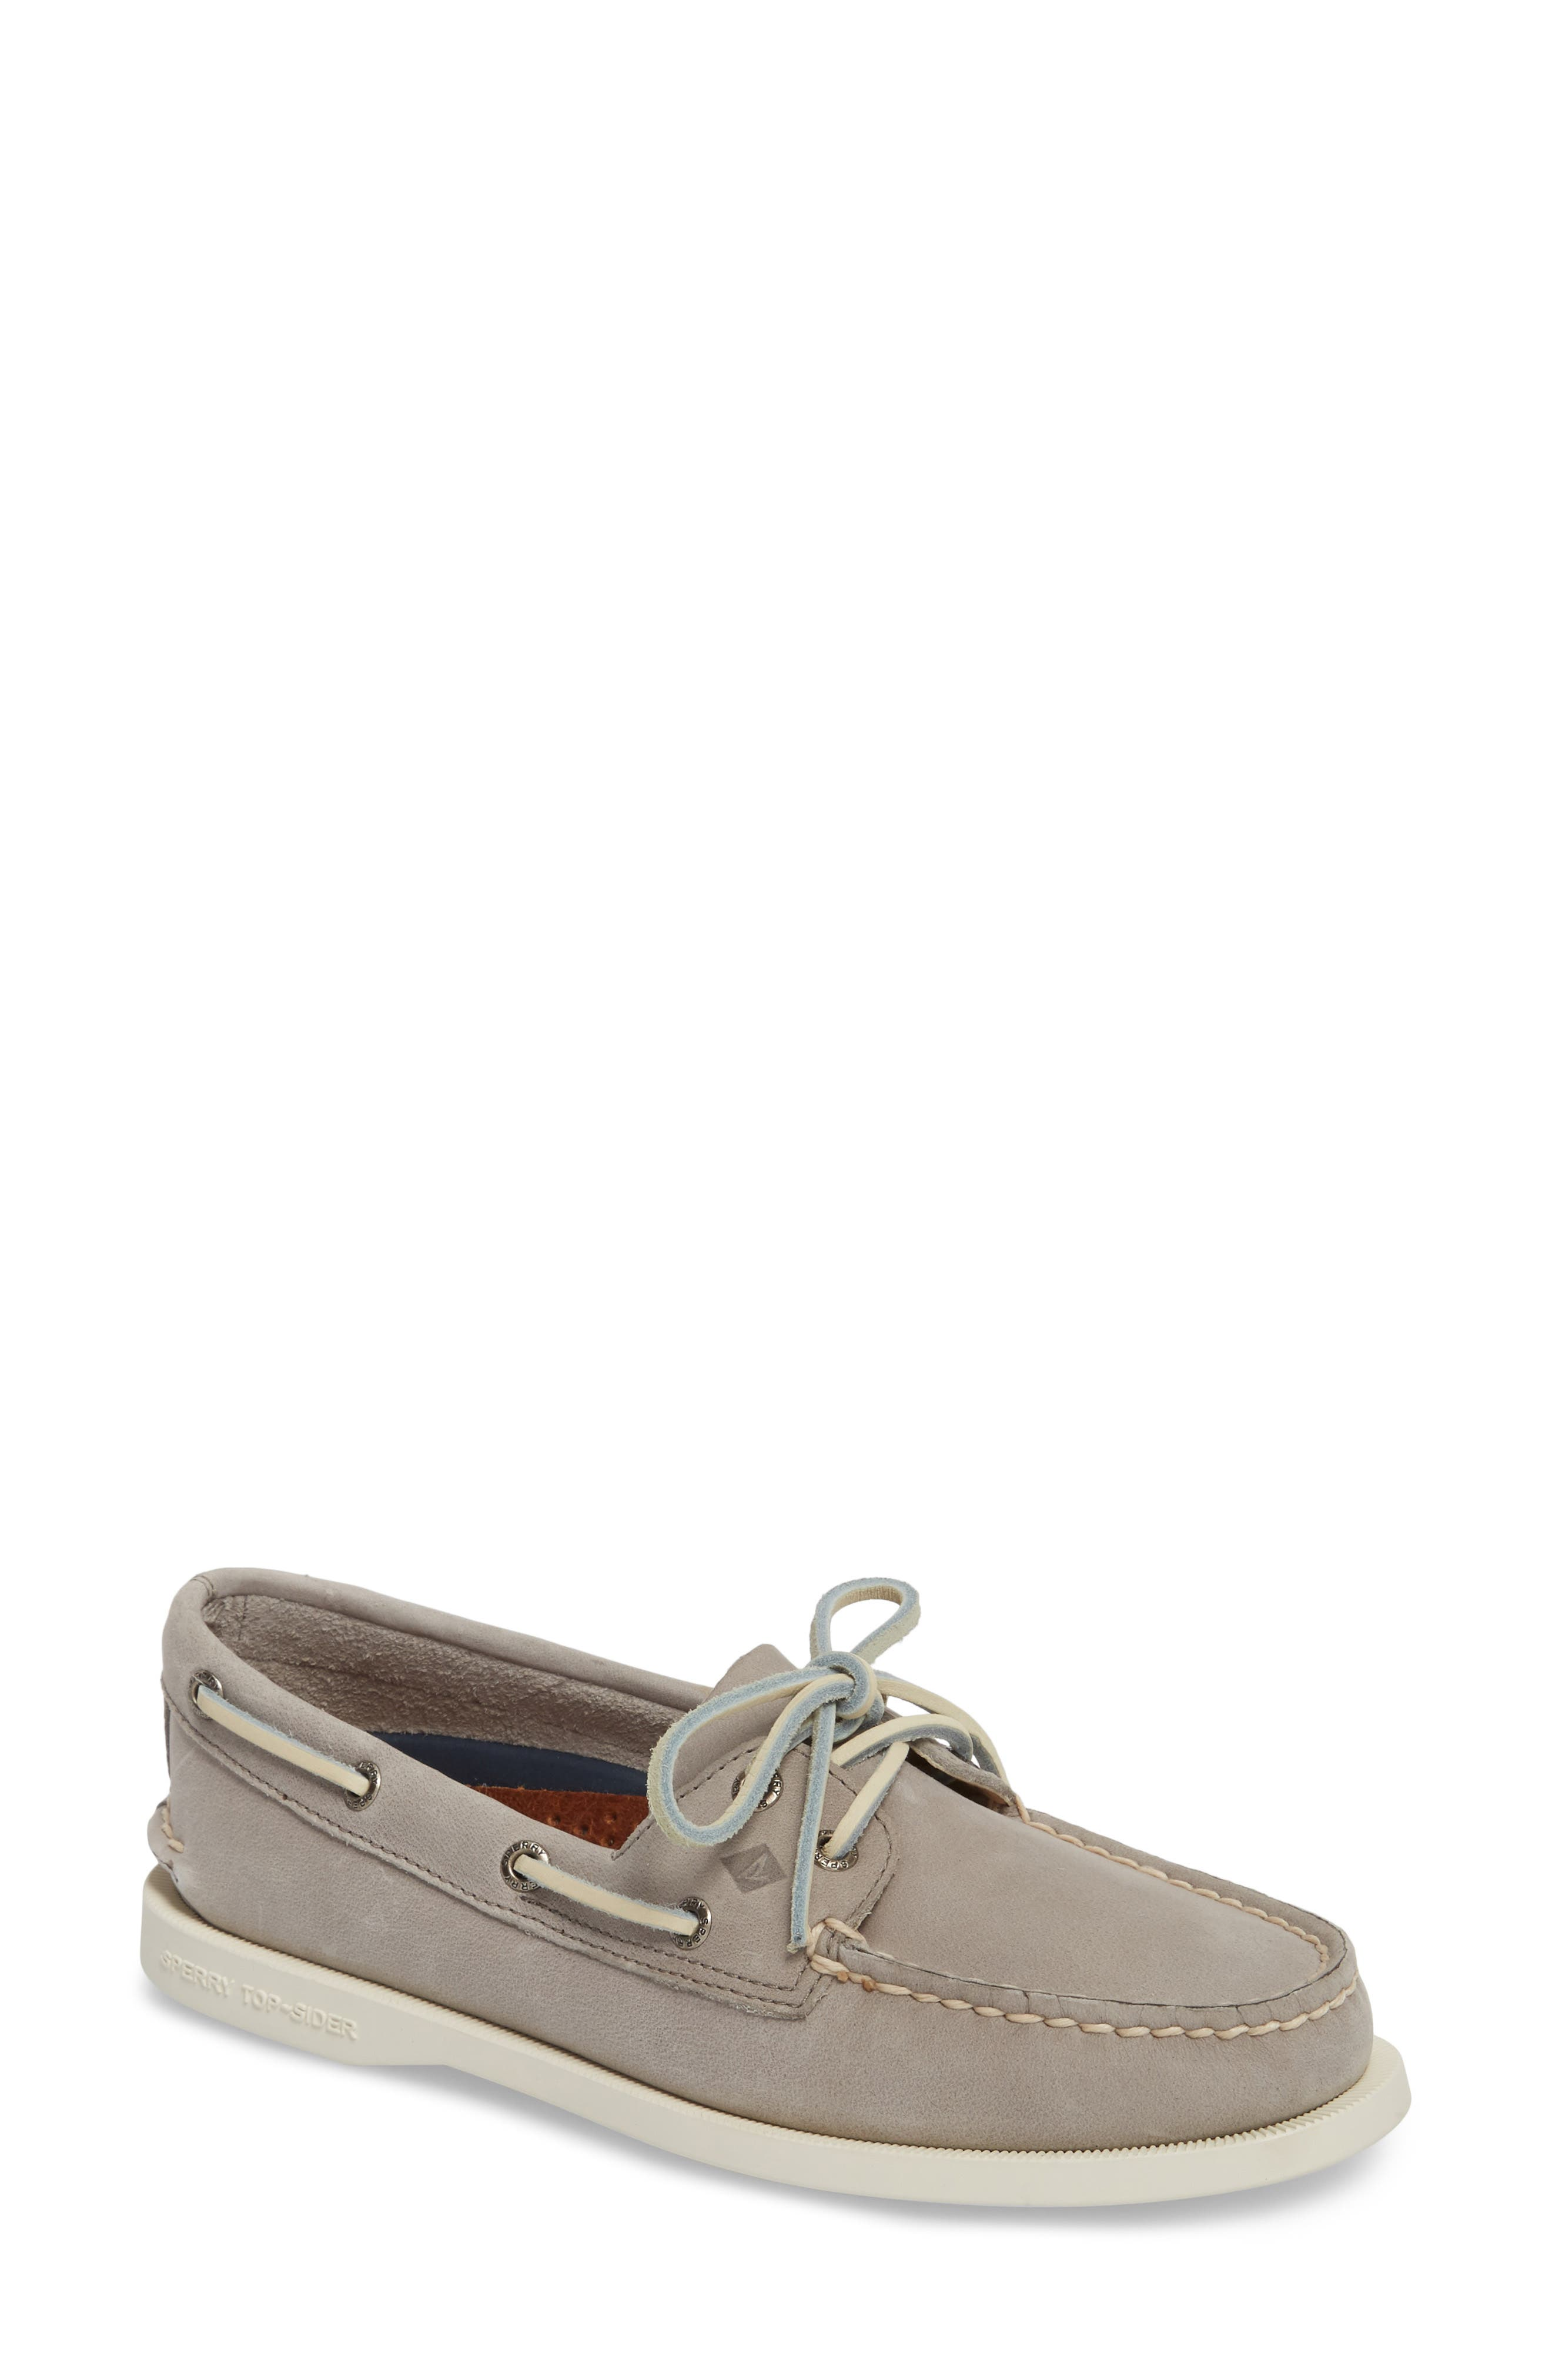 'Authentic Original' Boat Shoe,                         Main,                         color, Grey Leather